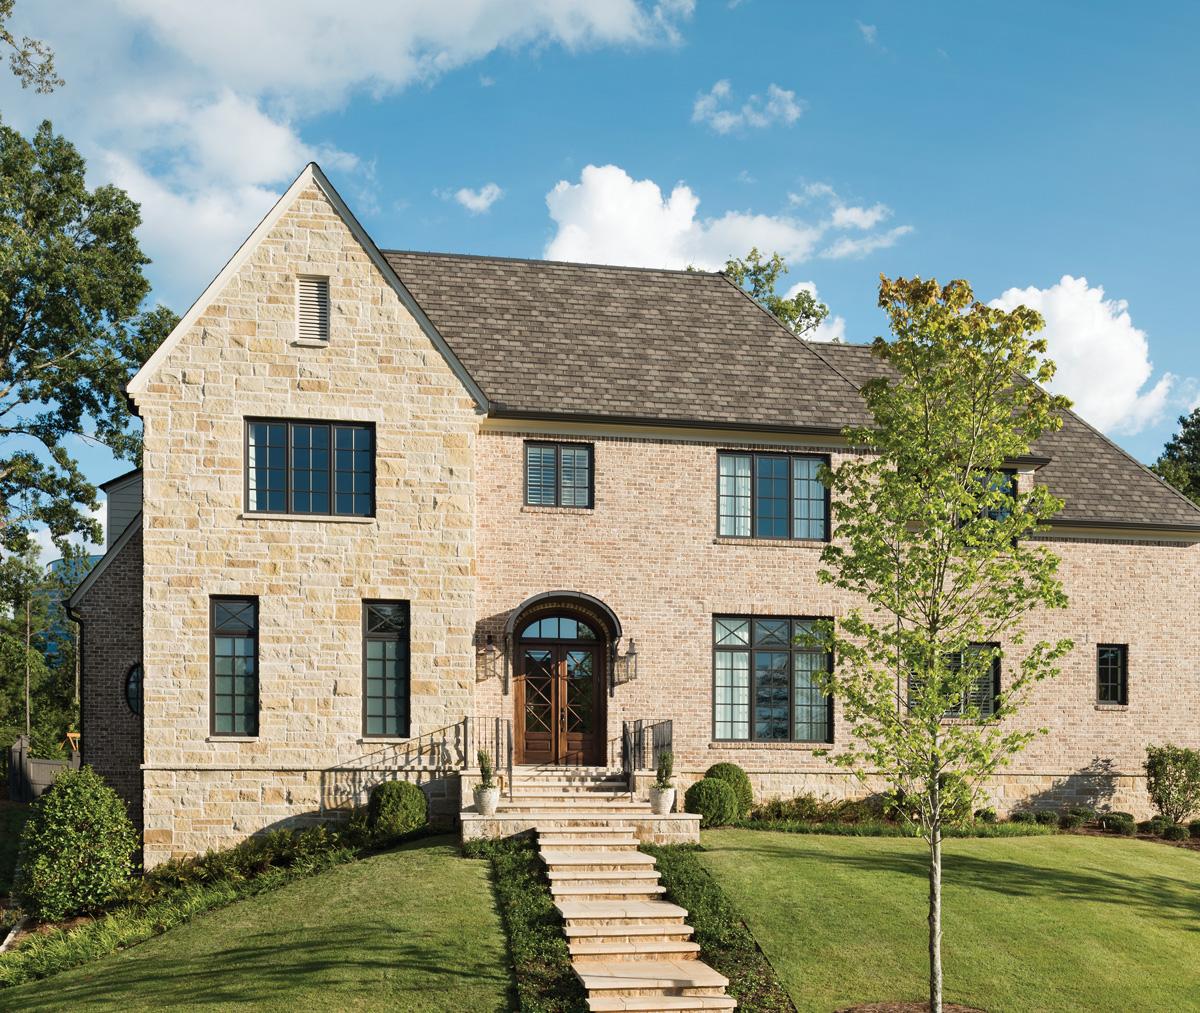 Freeman house exterior